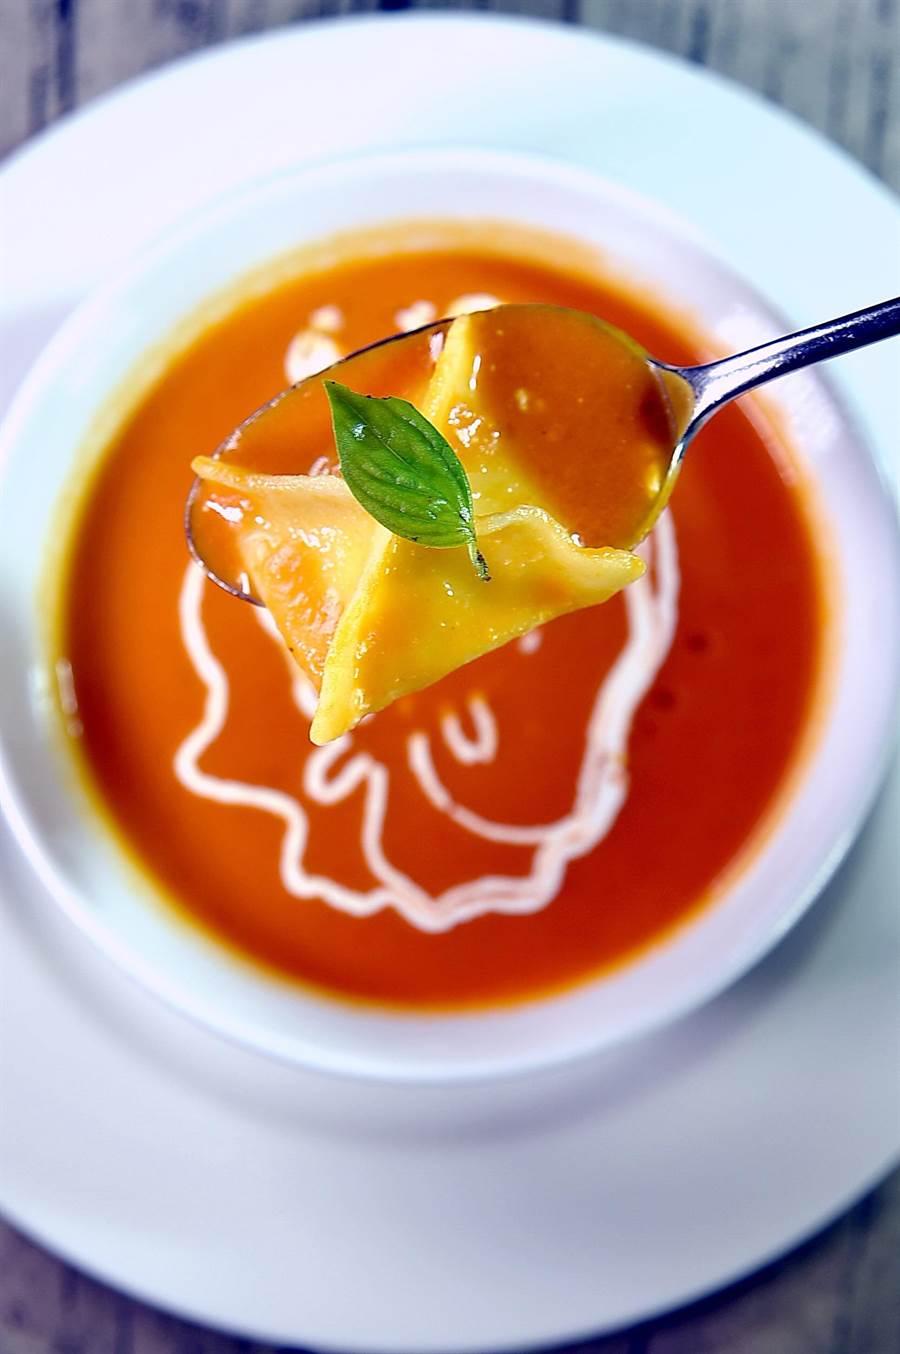 Vincenzo Gatti 為台北君悅〈Ziga Zaga〉設計新菜單,味道很「老」,形色卻很「新」。(圖/姚 舜)